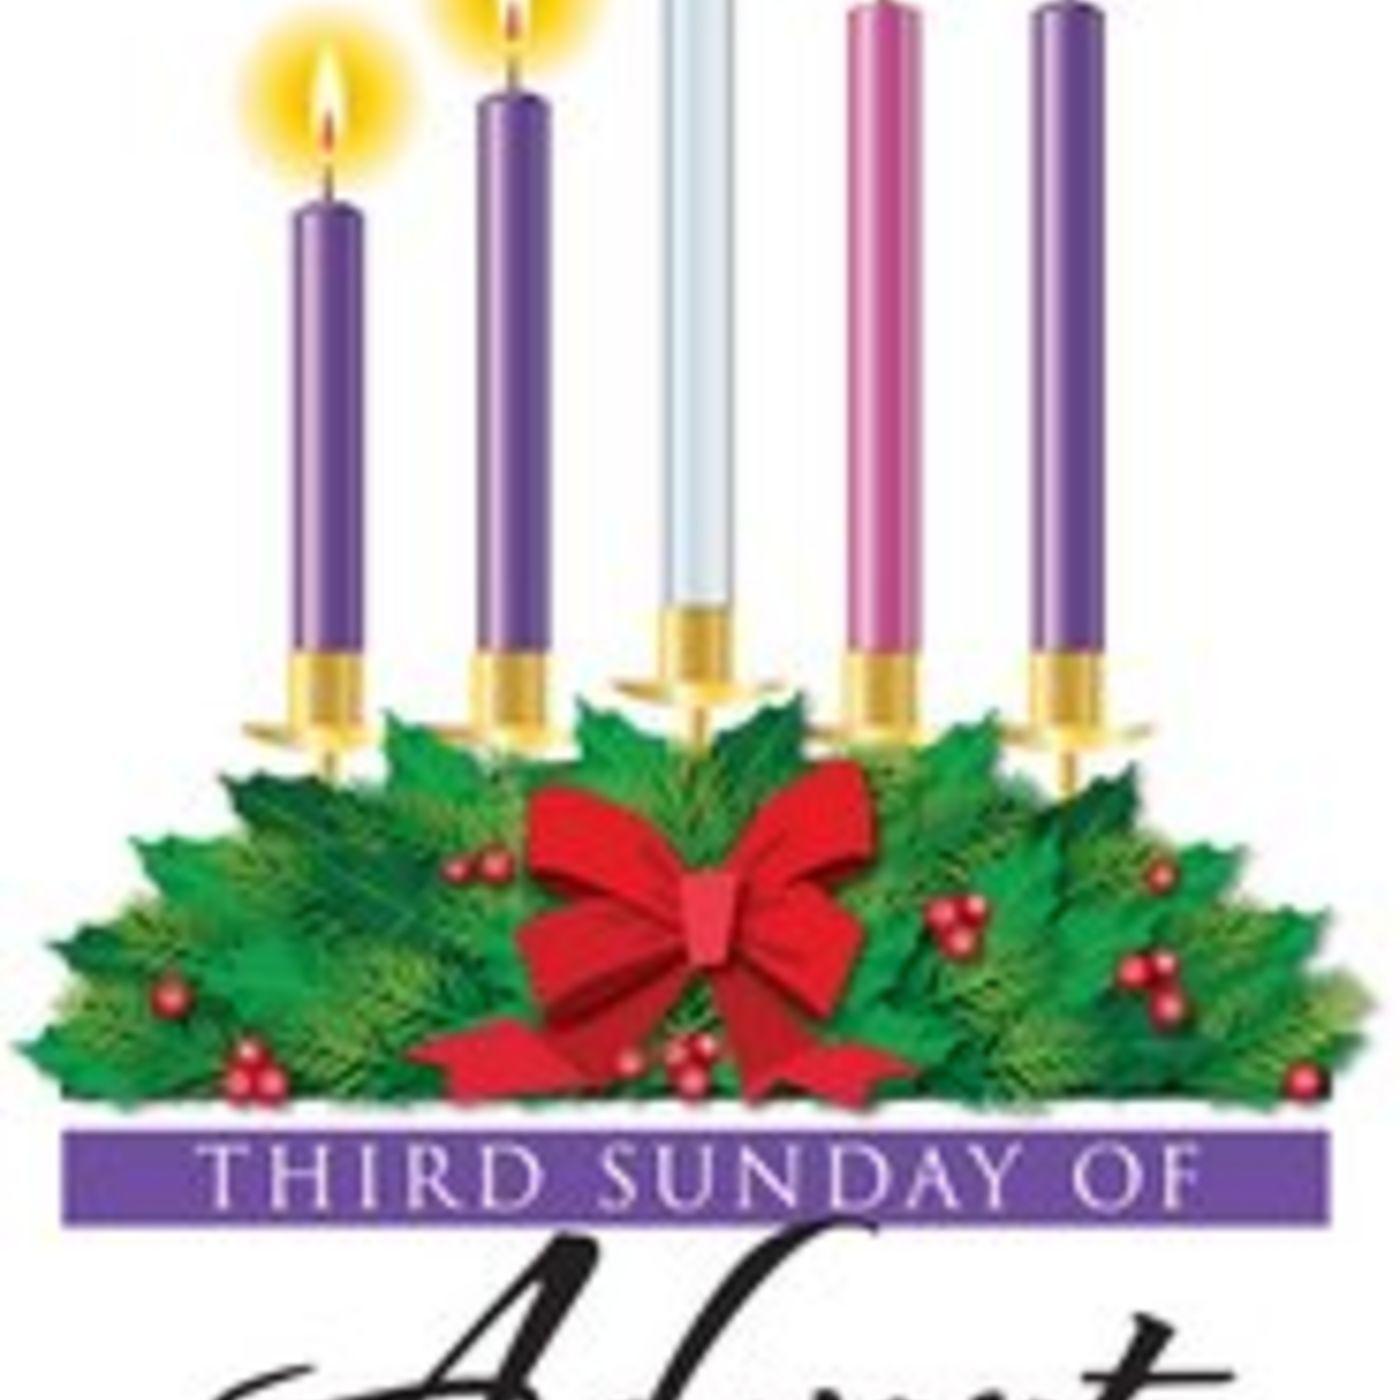 Third Sunday of Advent - Exultation